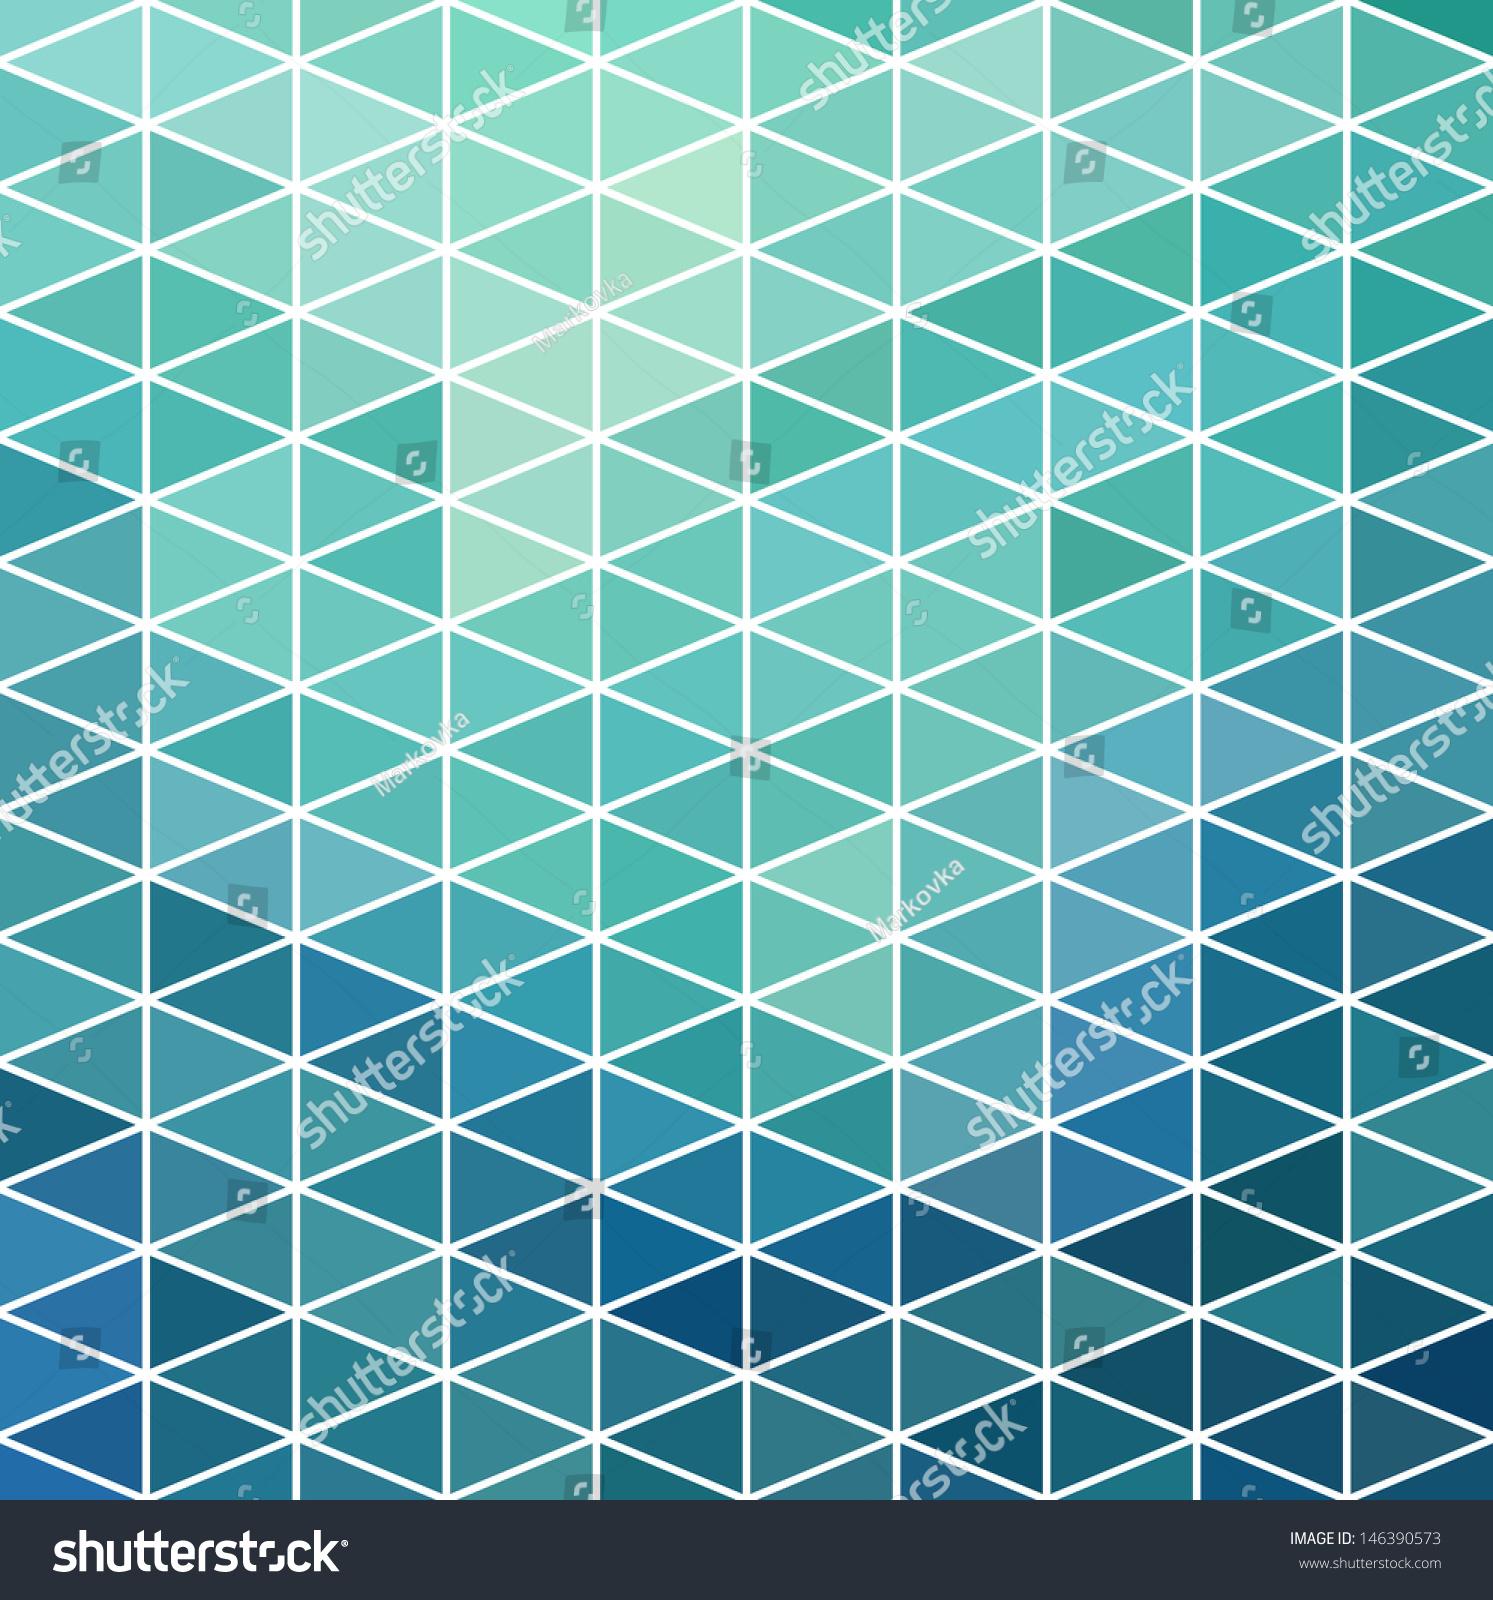 vector geometric pattern geometric shapes rhombus stock